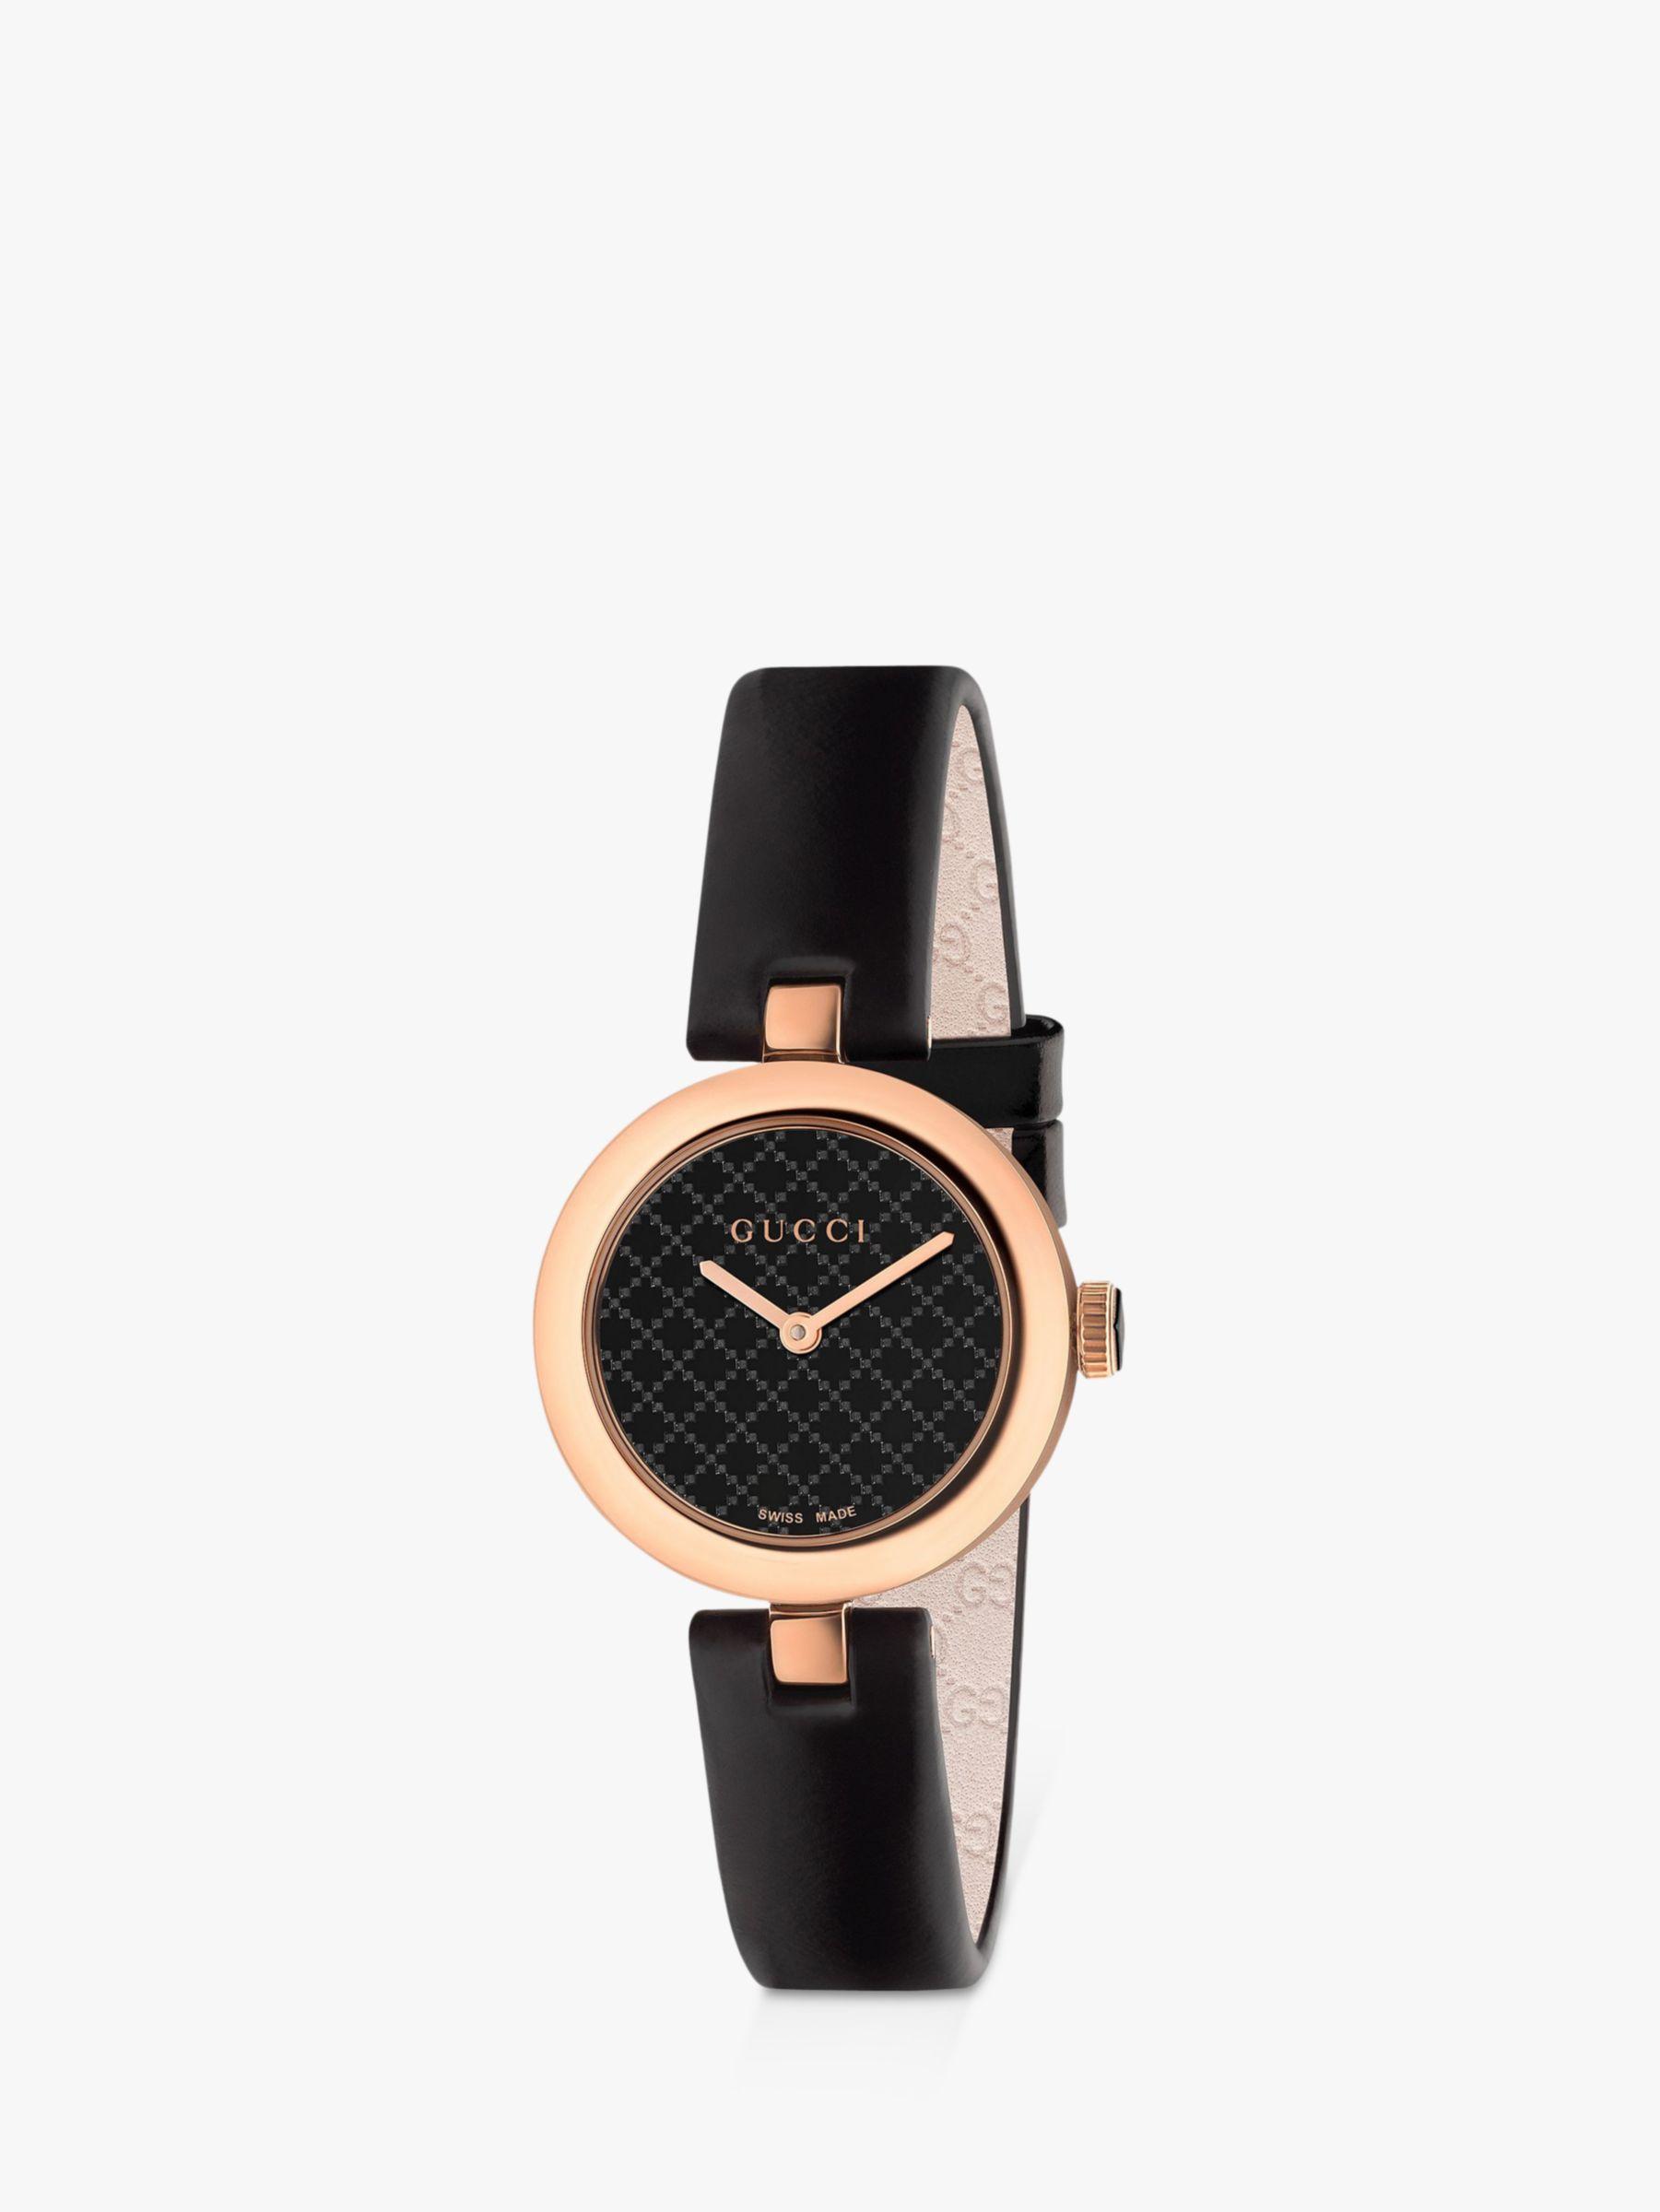 Gucci Gucci YA141501 Women's Diamantissima Leather Strap Watch, Black